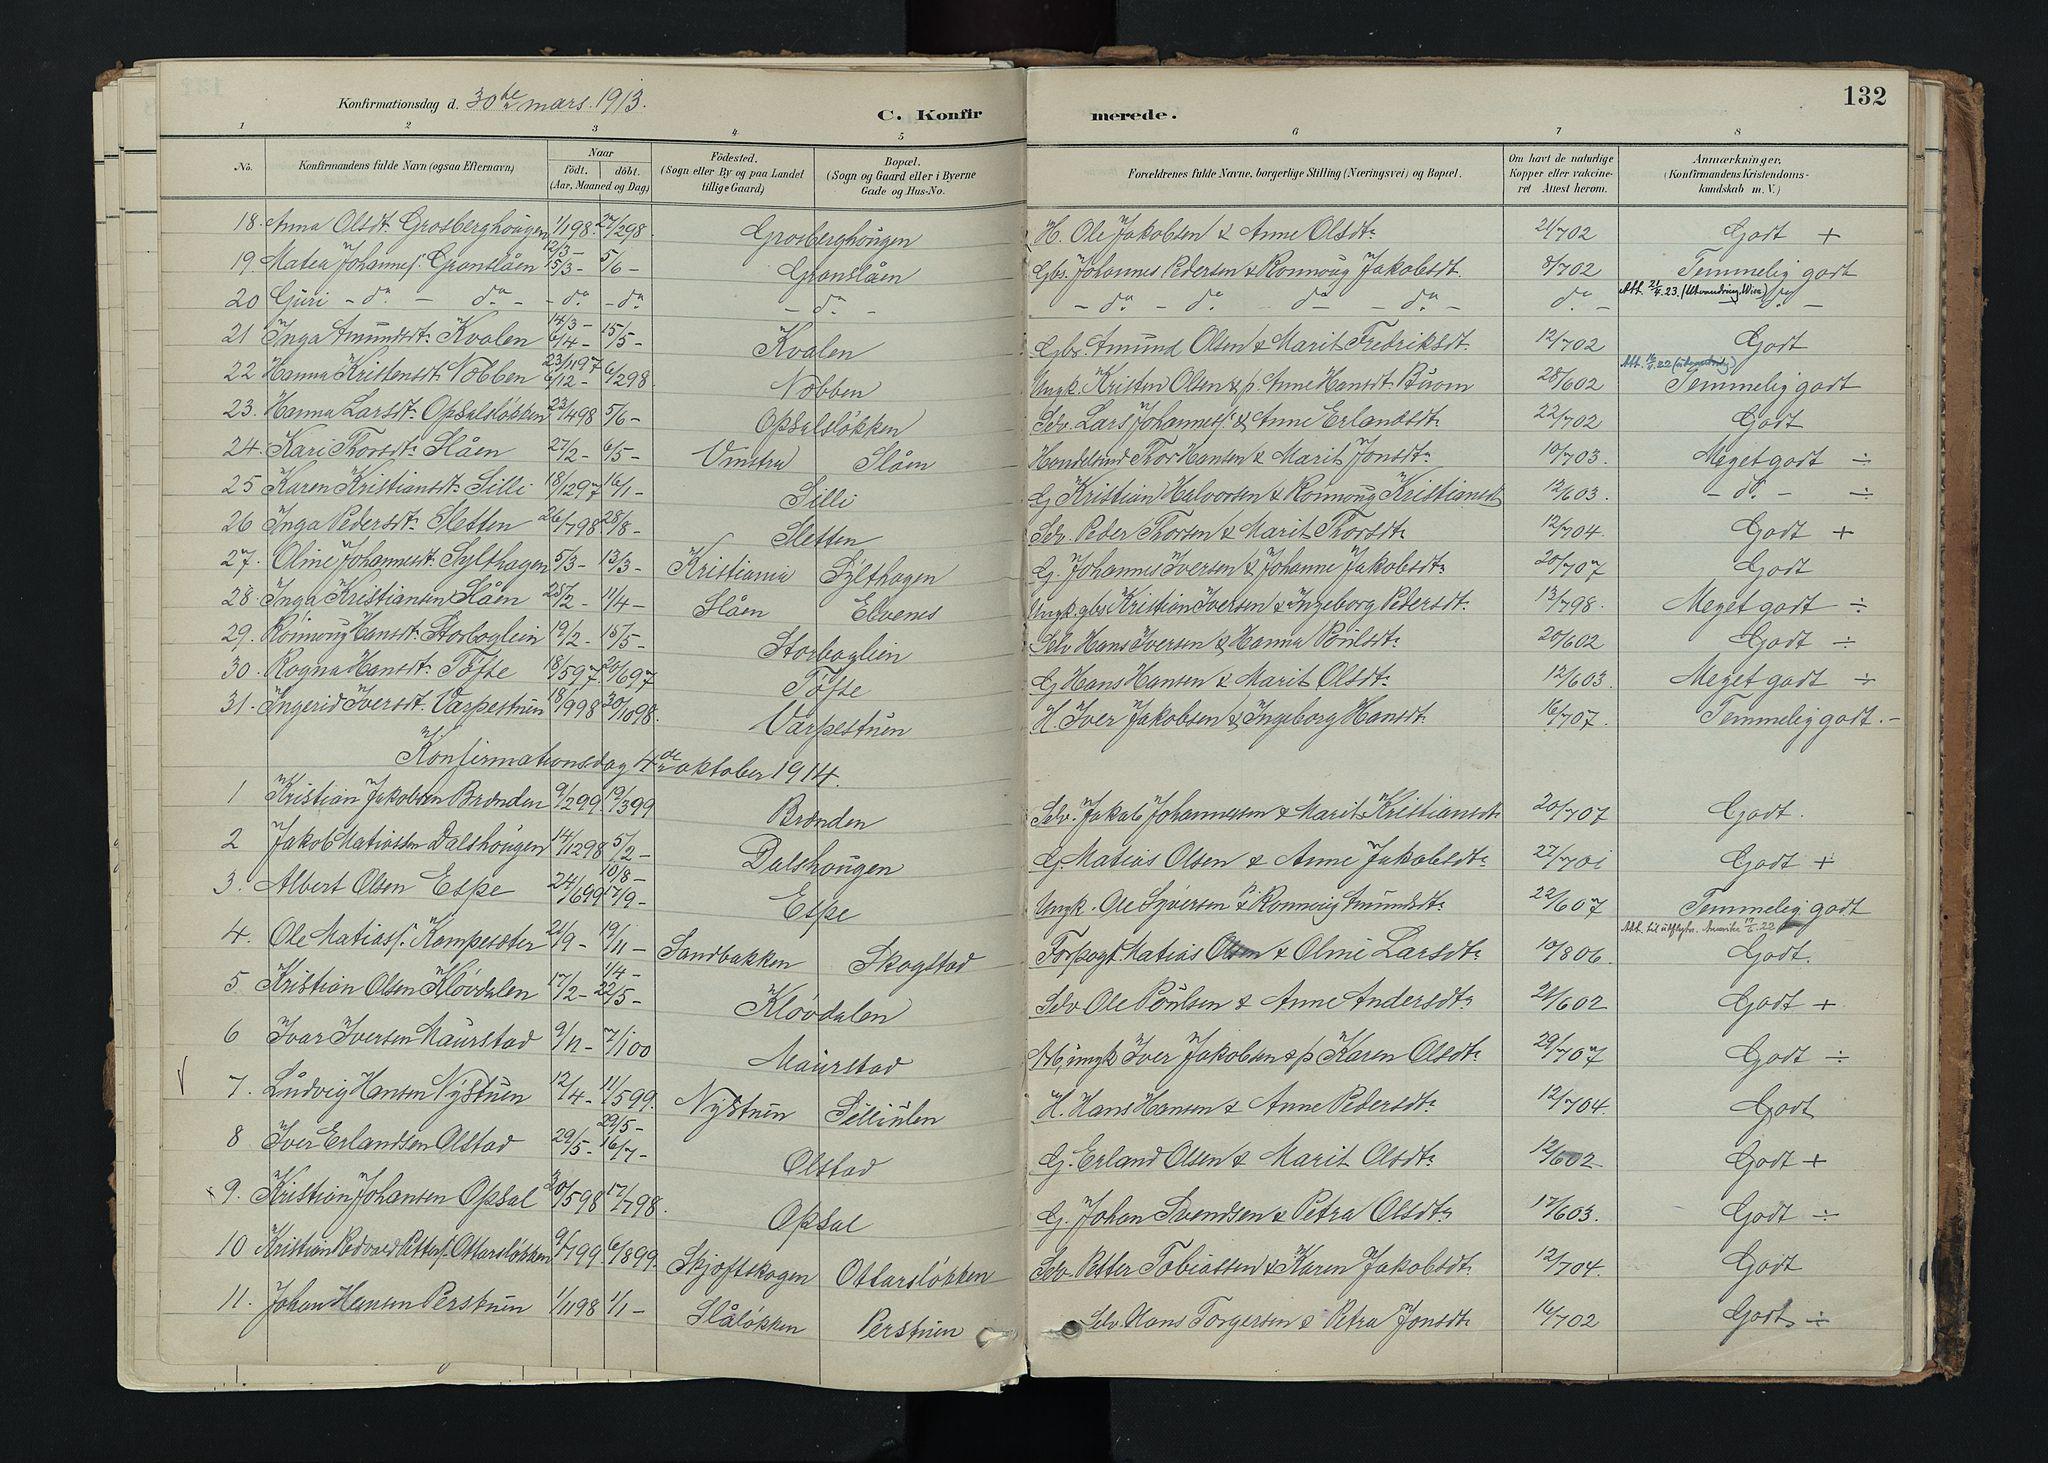 SAH, Nord-Fron prestekontor, Ministerialbok nr. 5, 1884-1914, s. 132